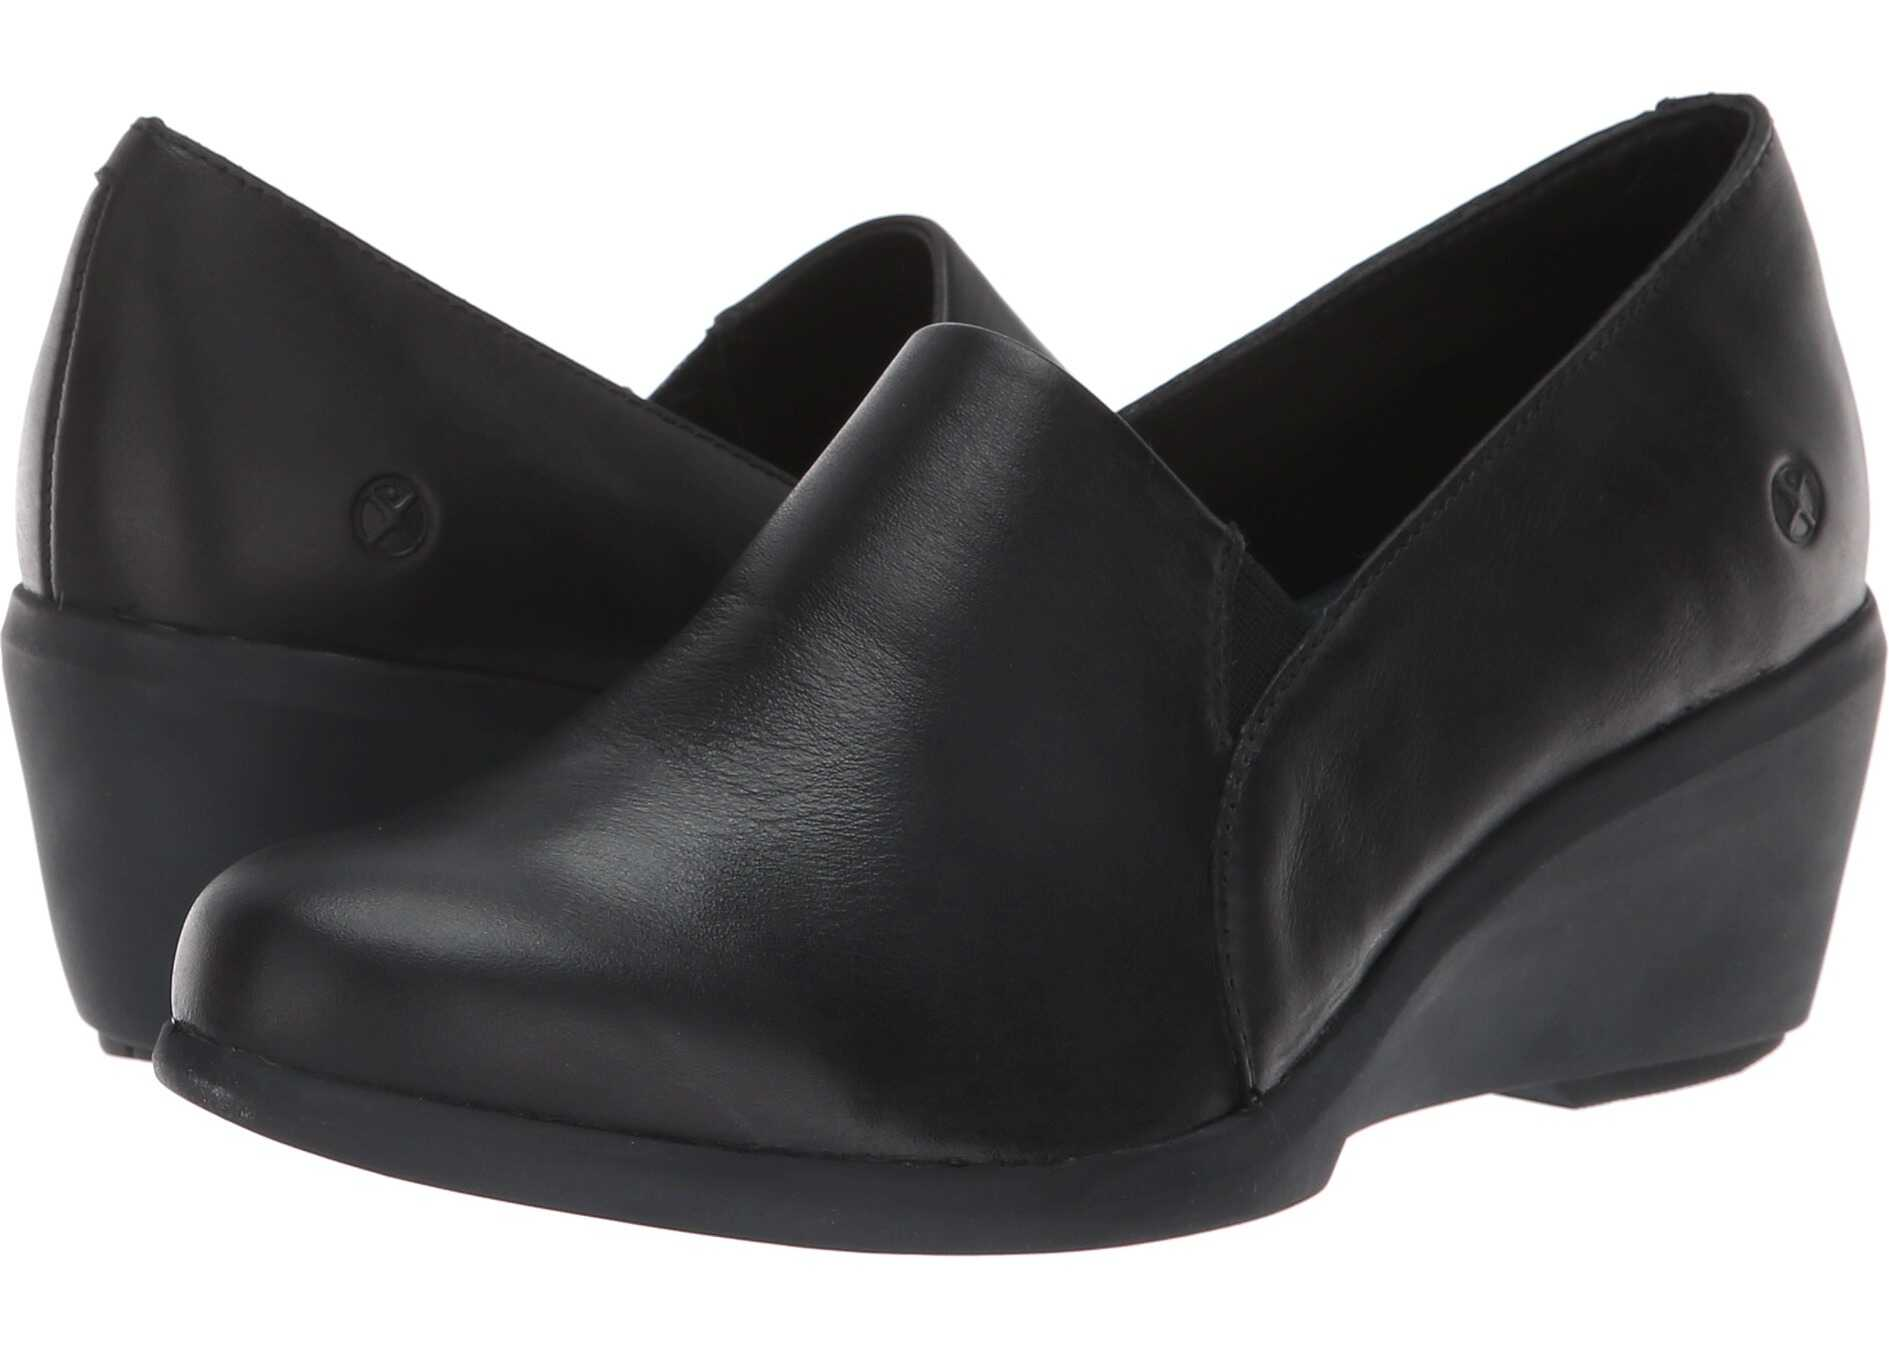 Hush Puppies Fraulein Mariya Black Shield Leather